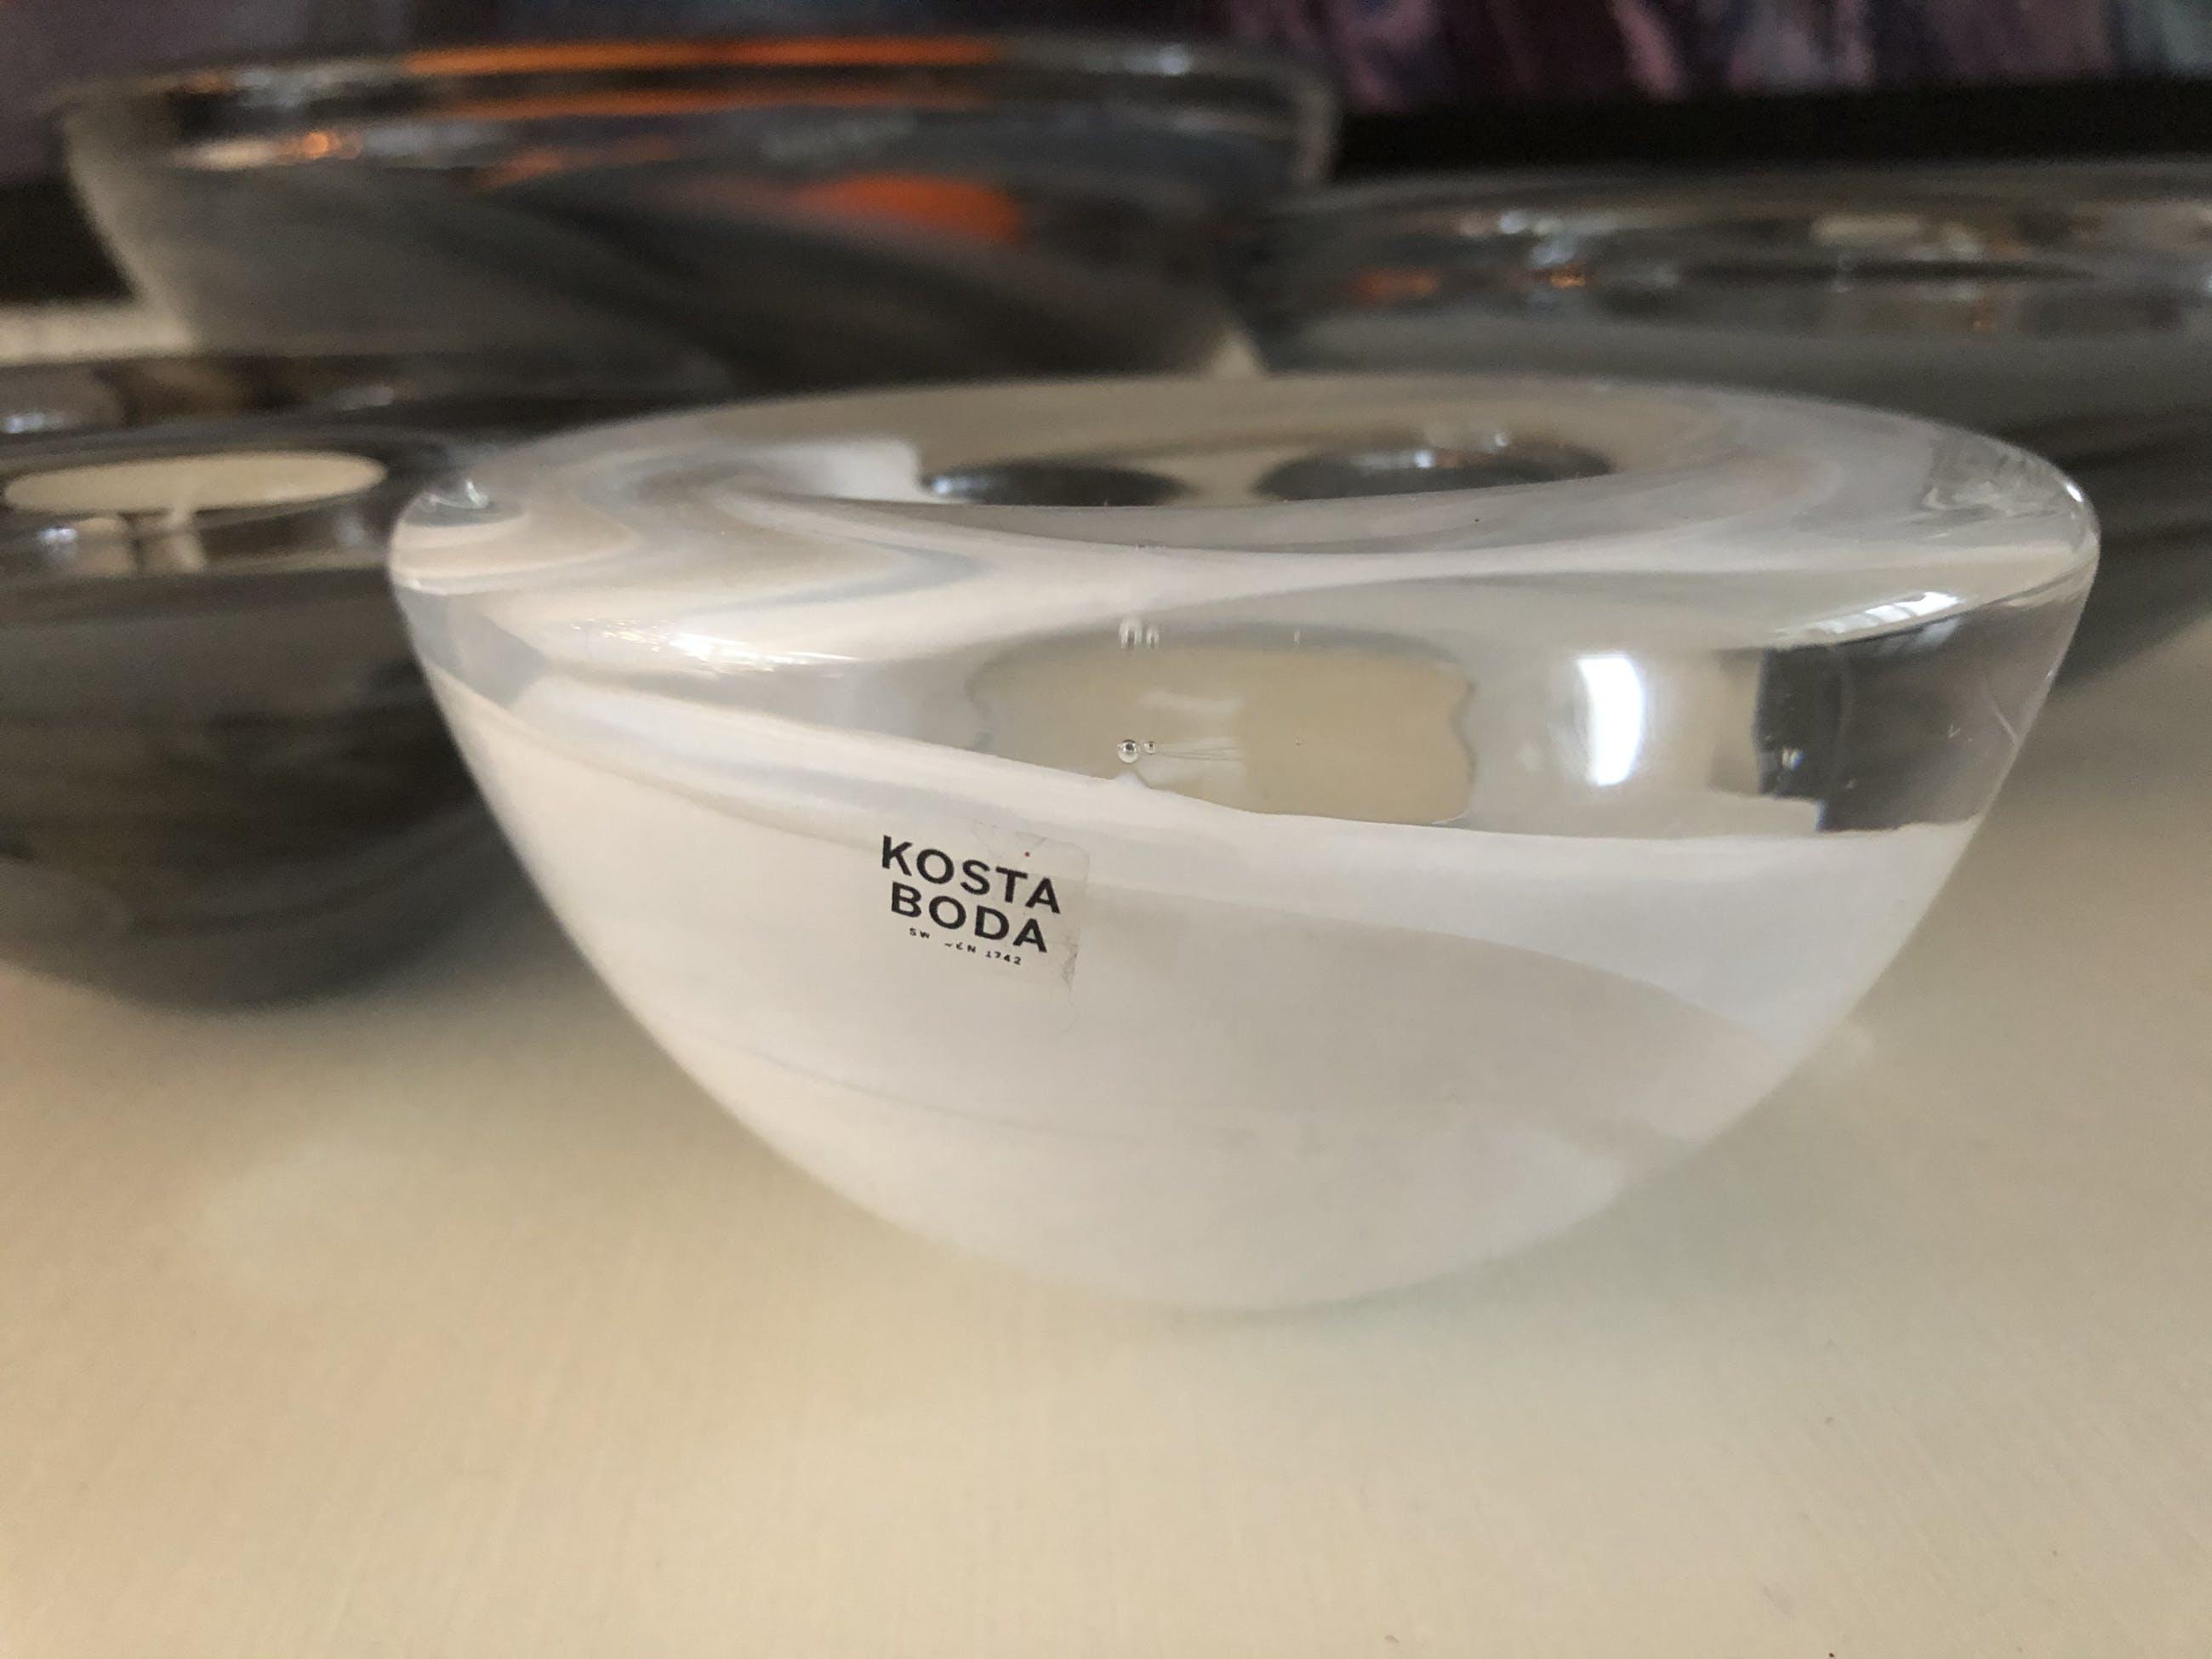 Kosta Boda - Atoll Votive grijs kopen? Bied vanaf 50!